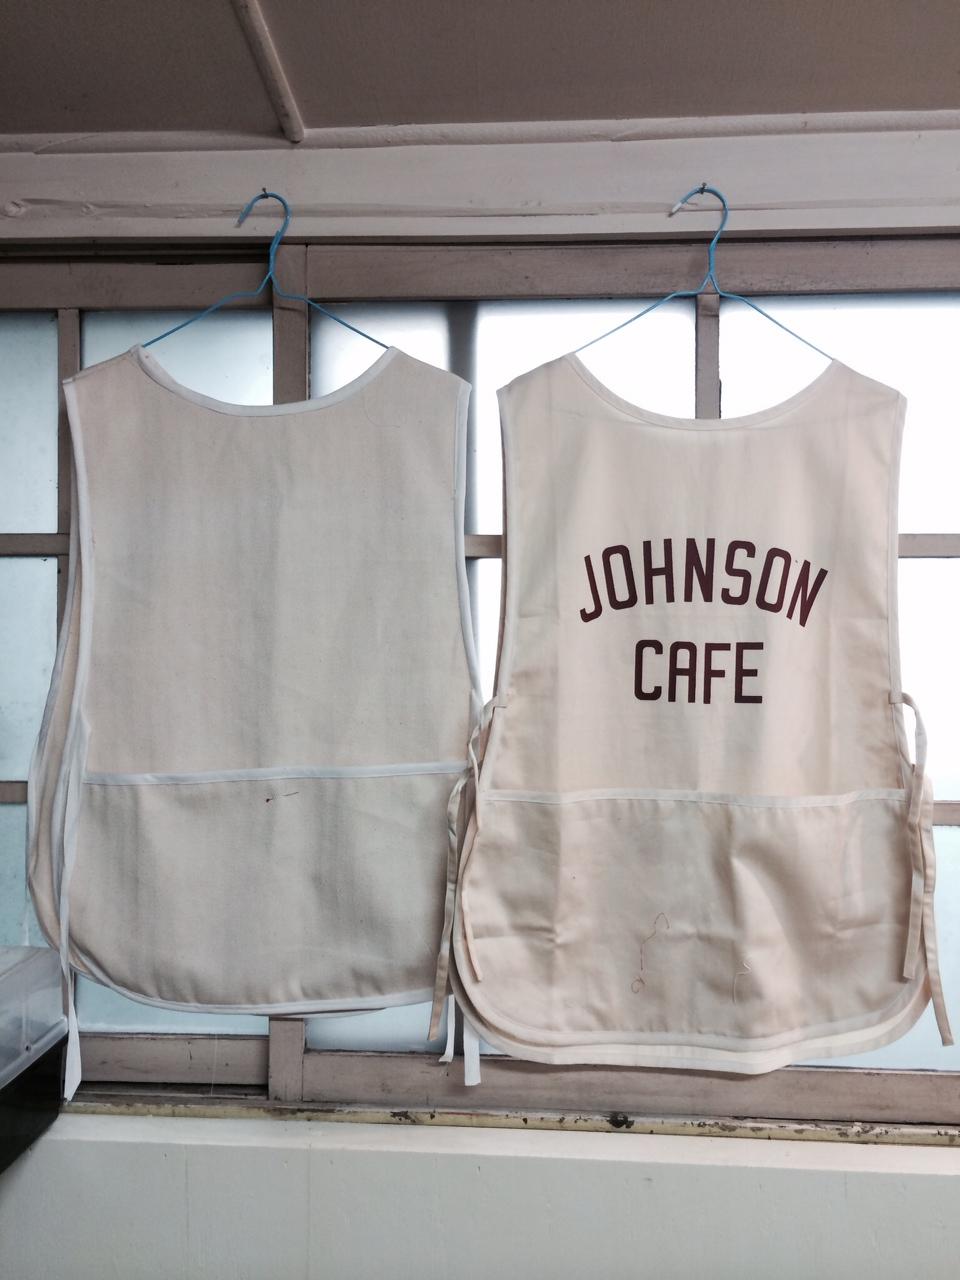 JOHNSON CAFE